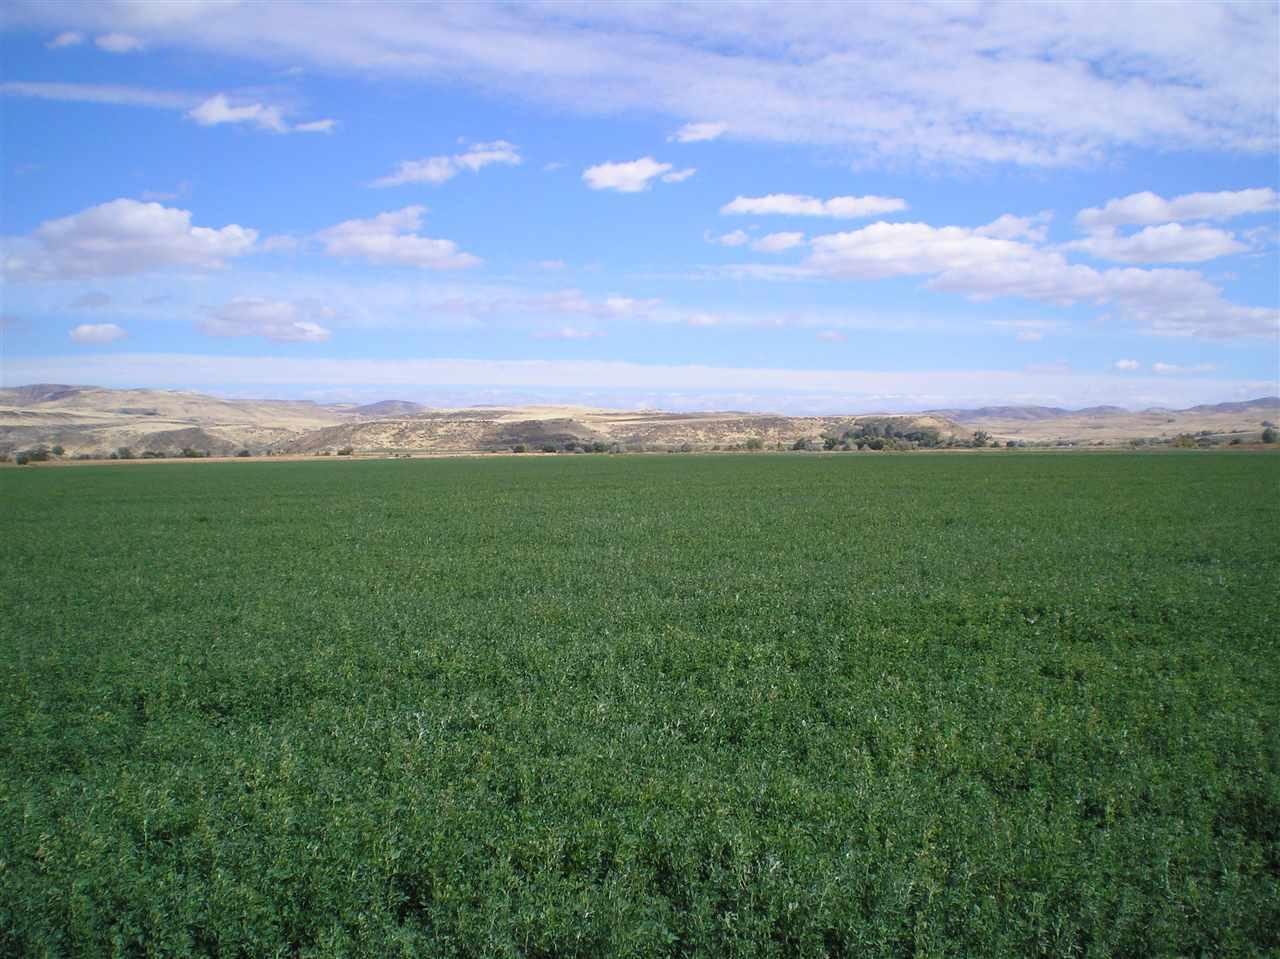 2061 Weiser River Road,Weiser,Idaho 83672,Farm & Ranch,2061 Weiser River Road,98649536